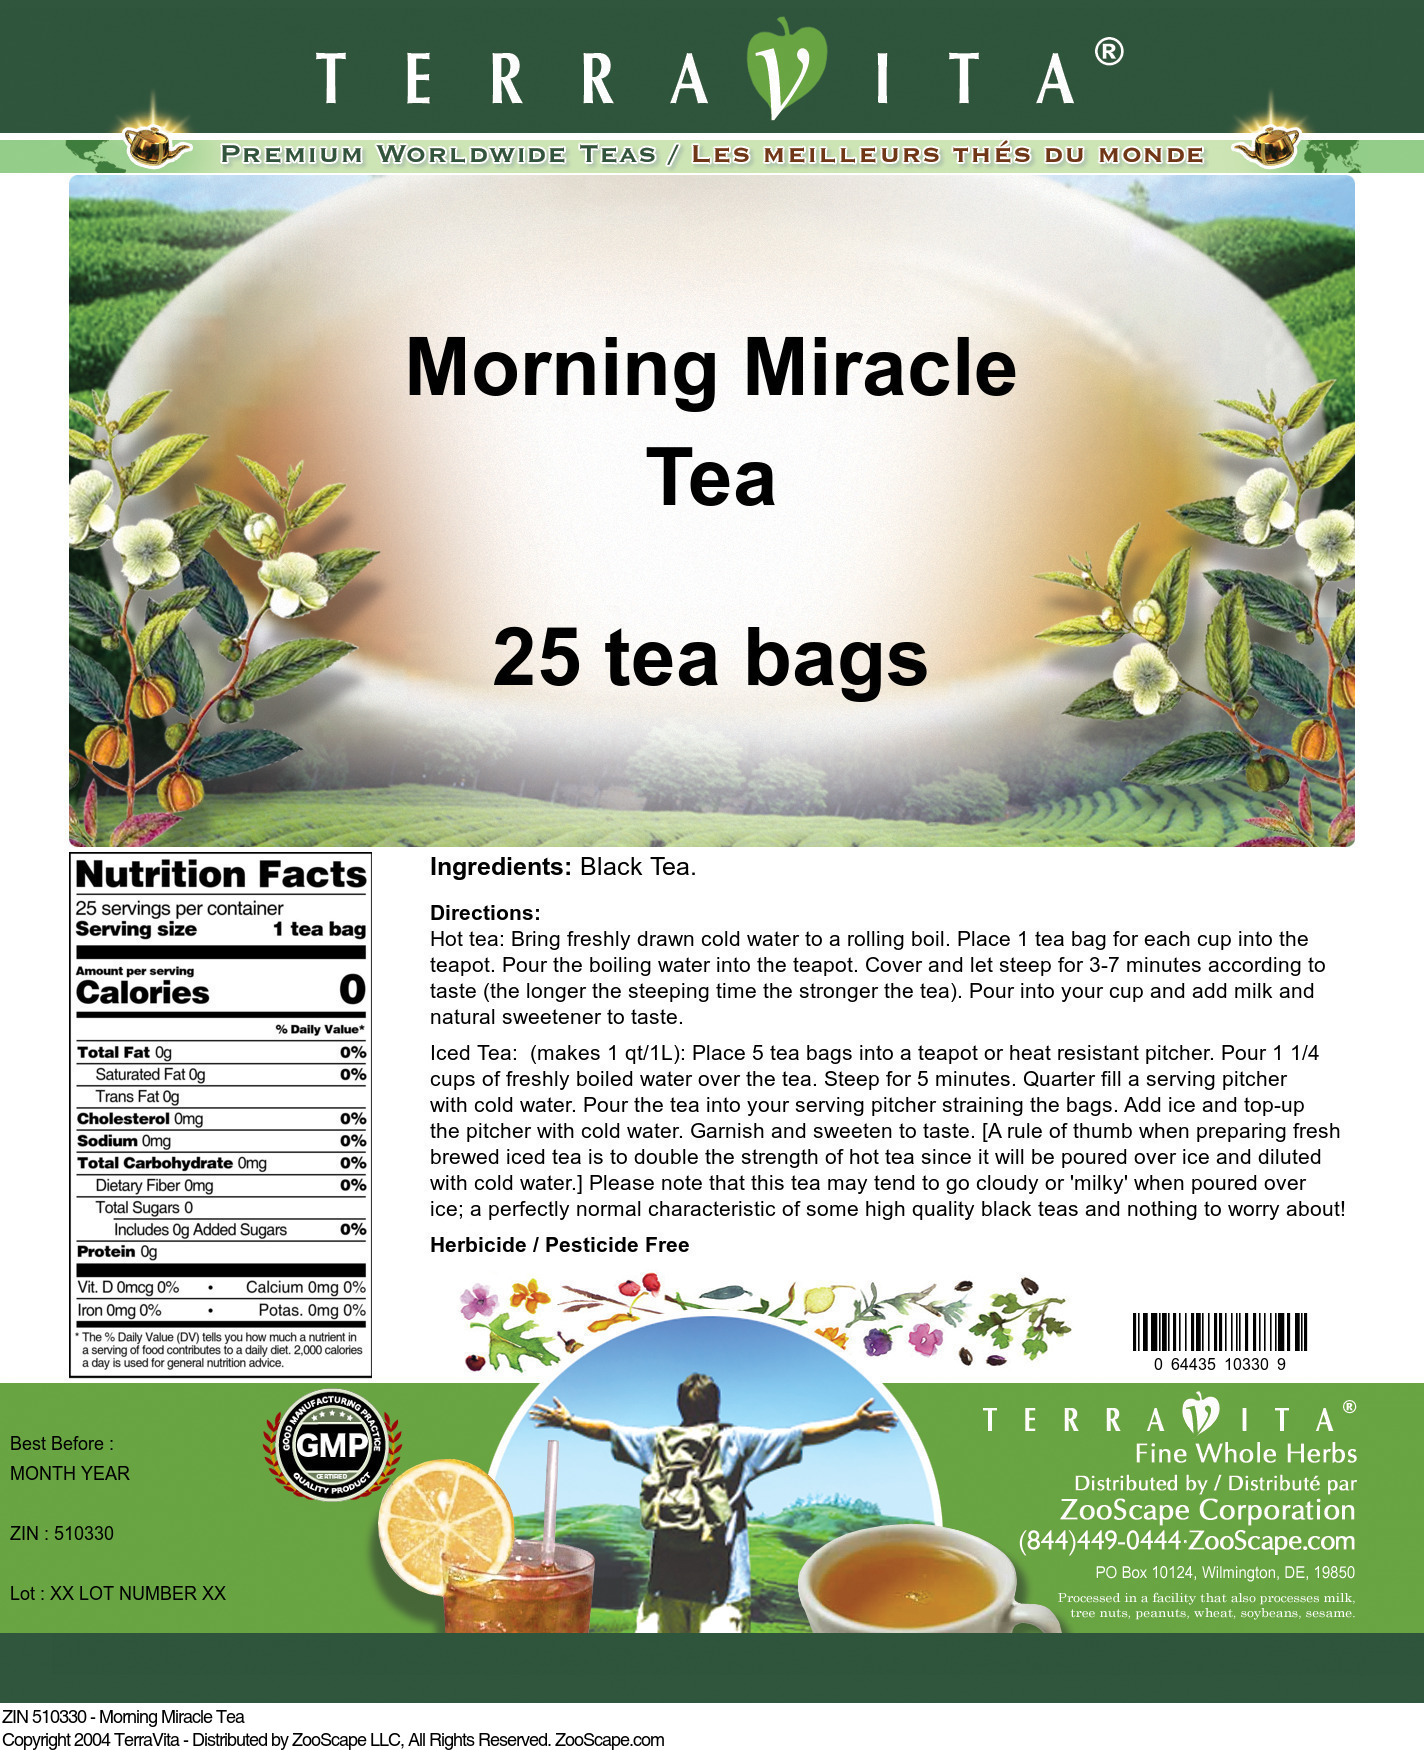 Morning Miracle Tea